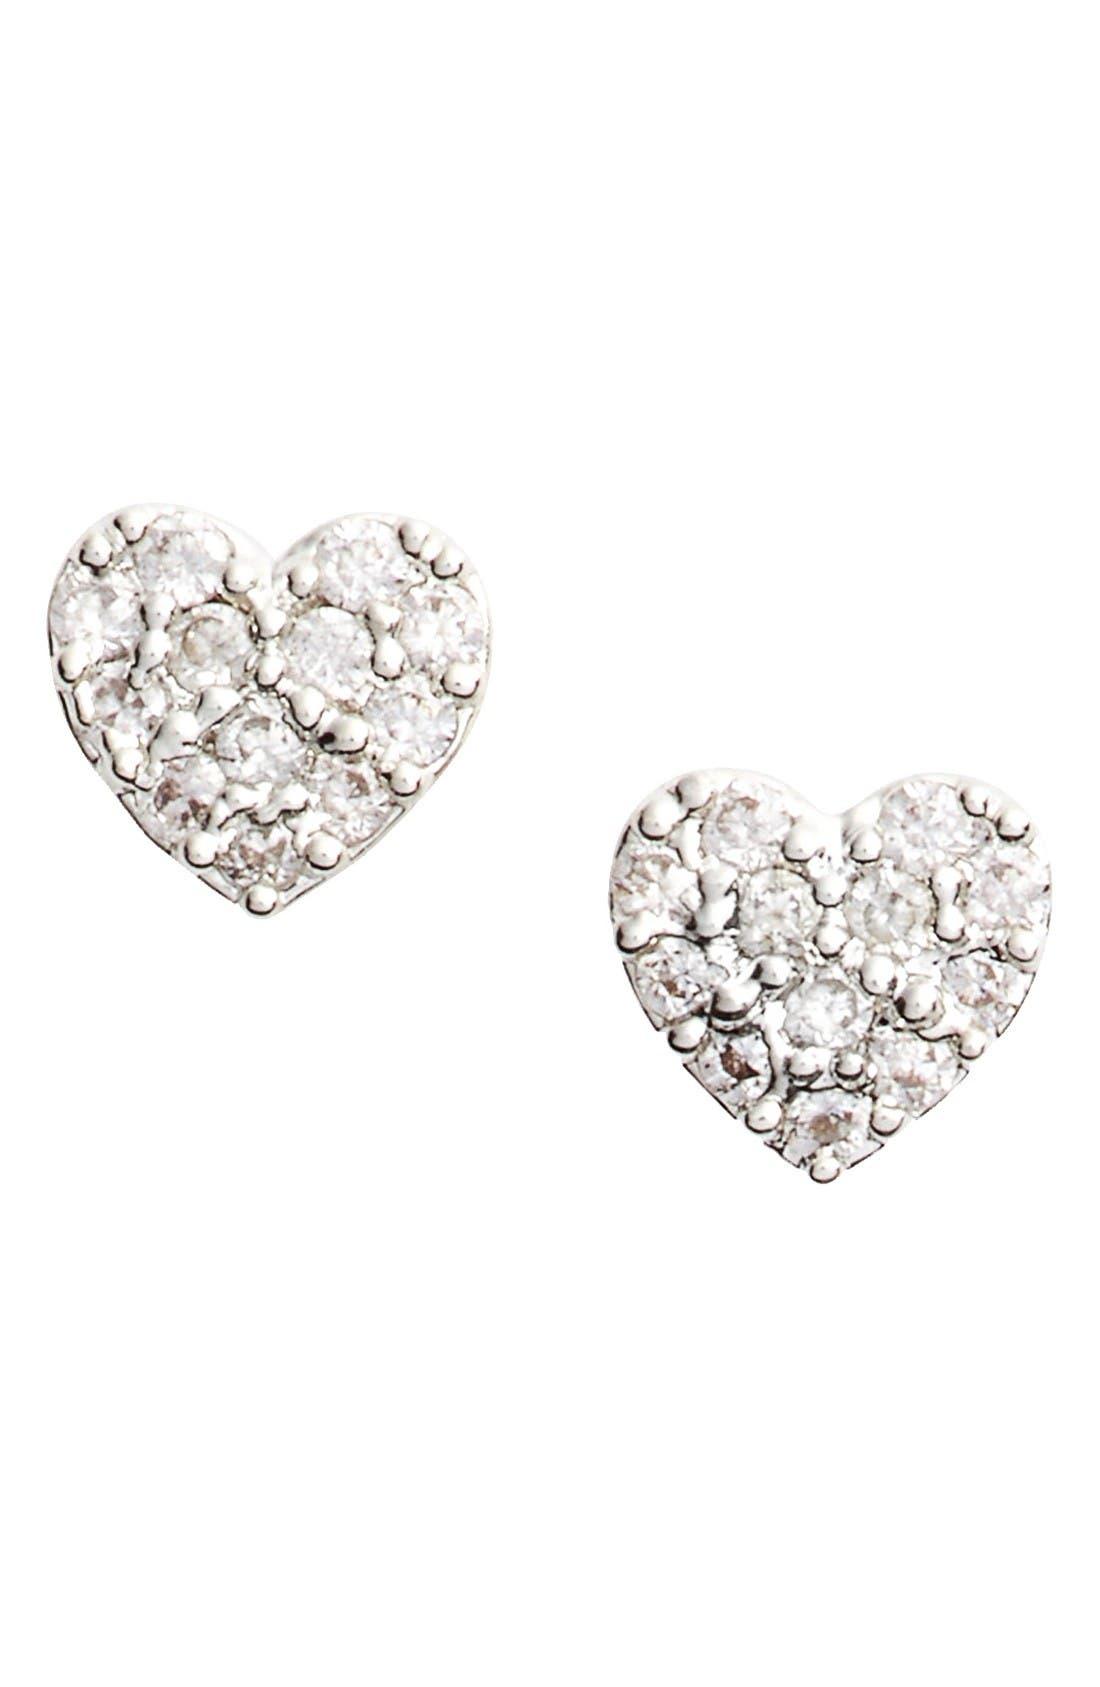 Shine Bright Heart Stud Earrings,                         Main,                         color, Silver